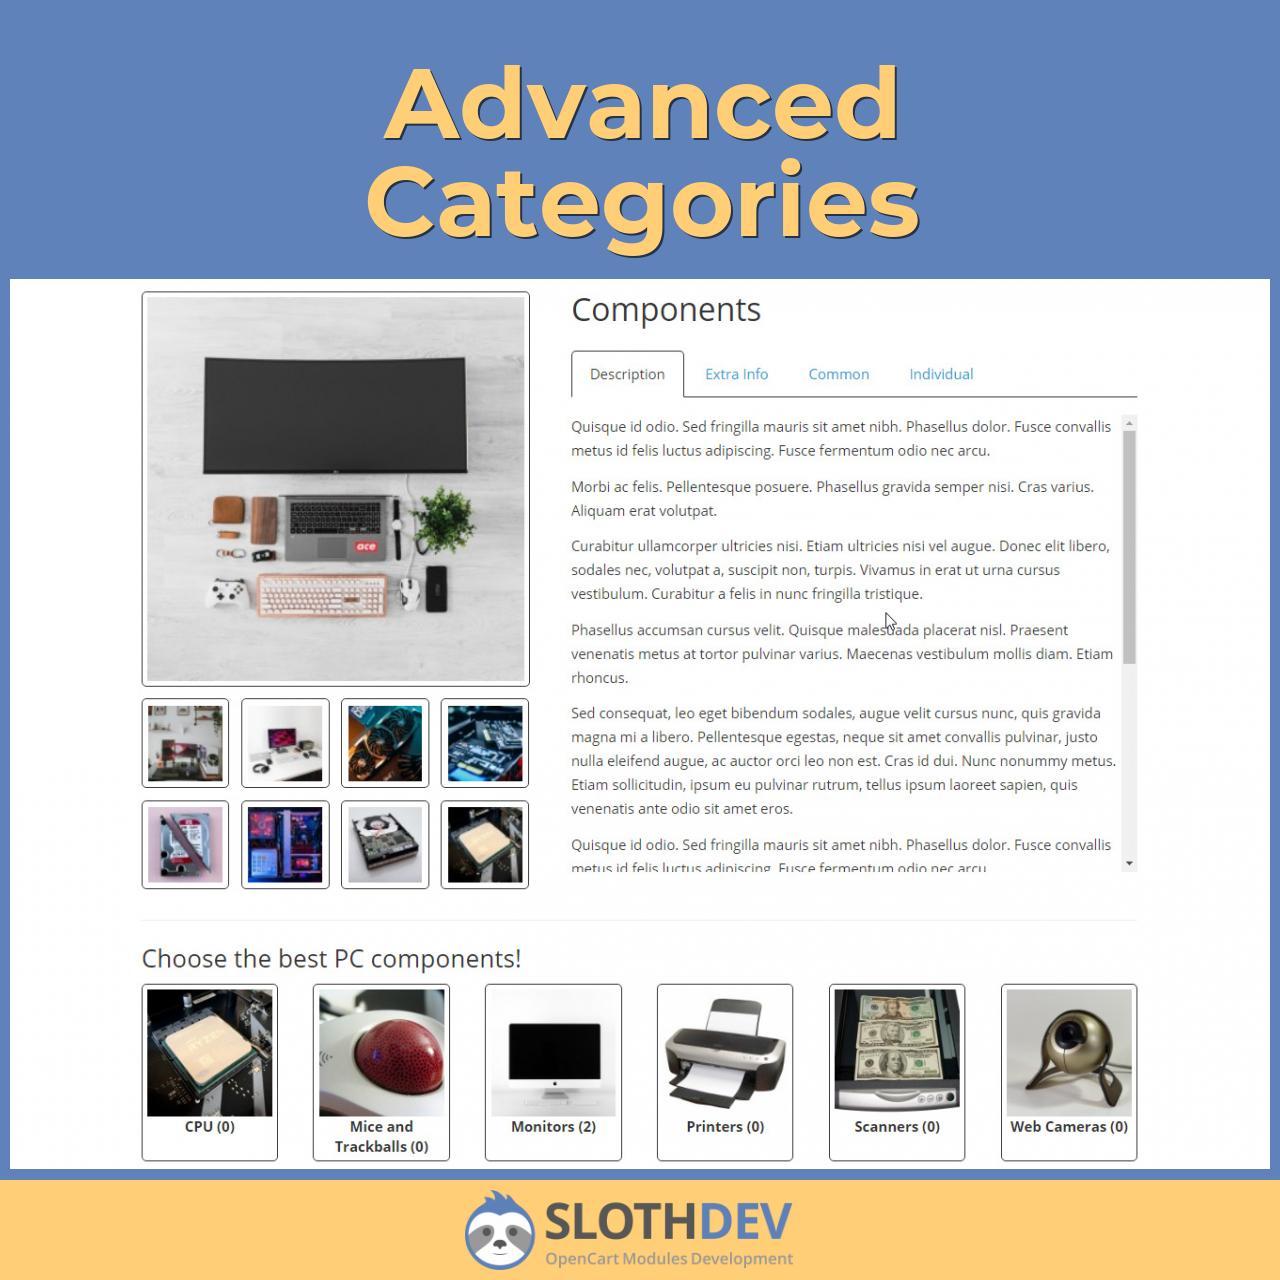 Advanced Categories